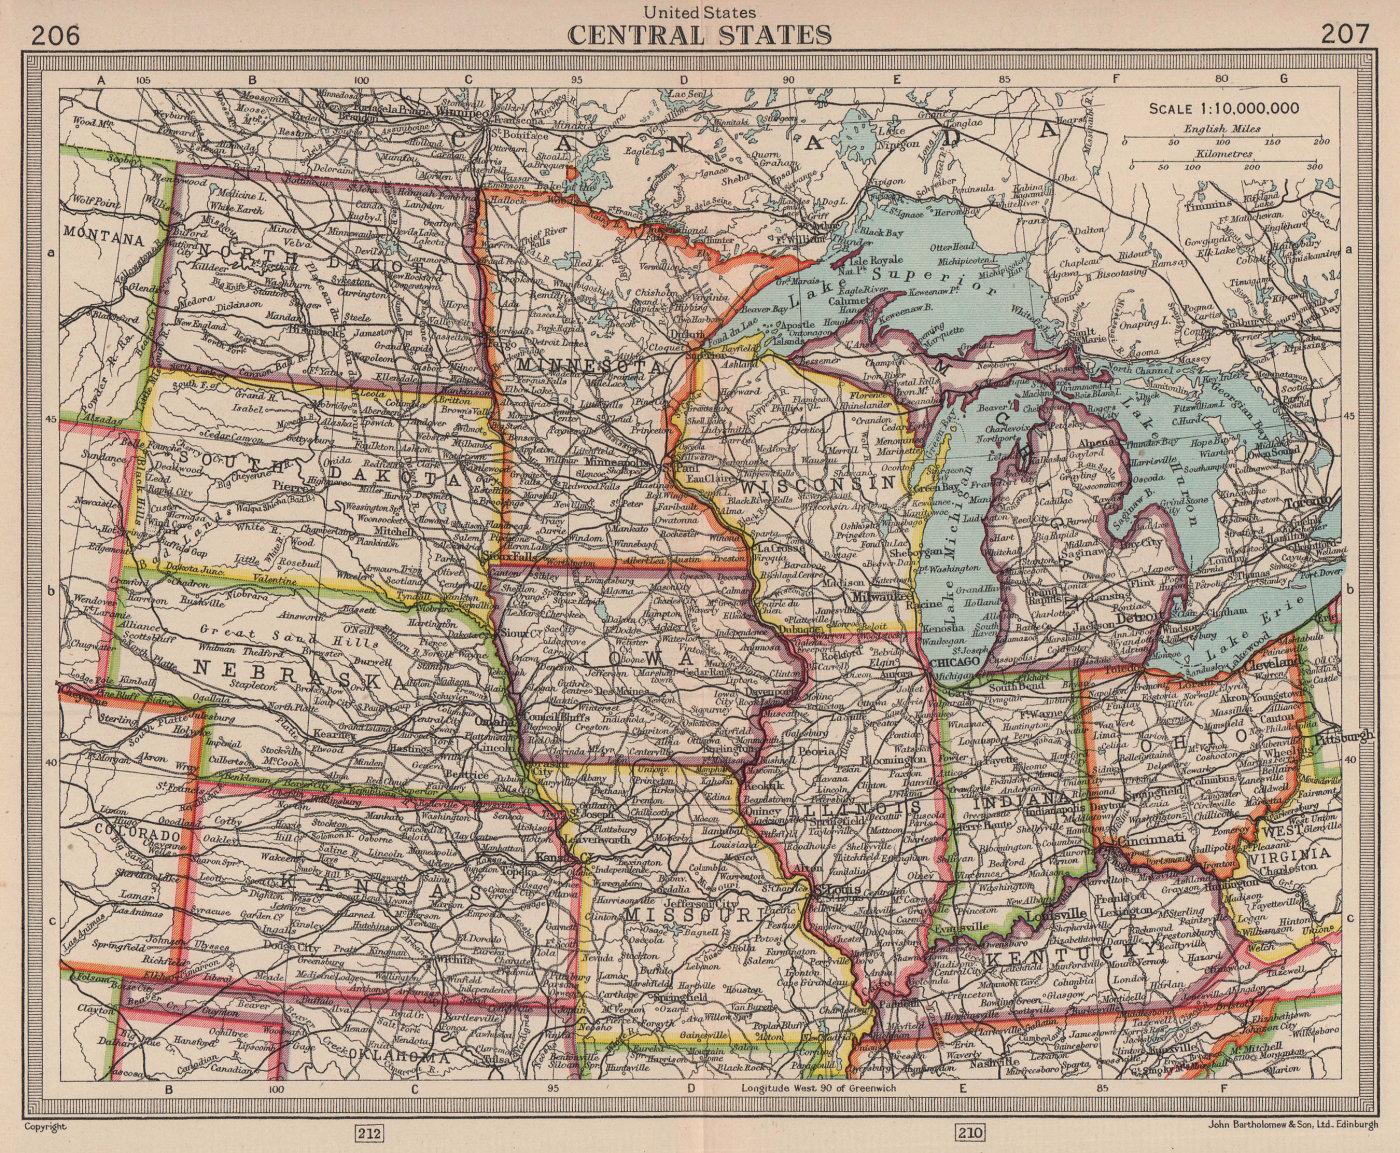 United States Central states. Midwestern USA. BARTHOLOMEW 1949 old vintage map